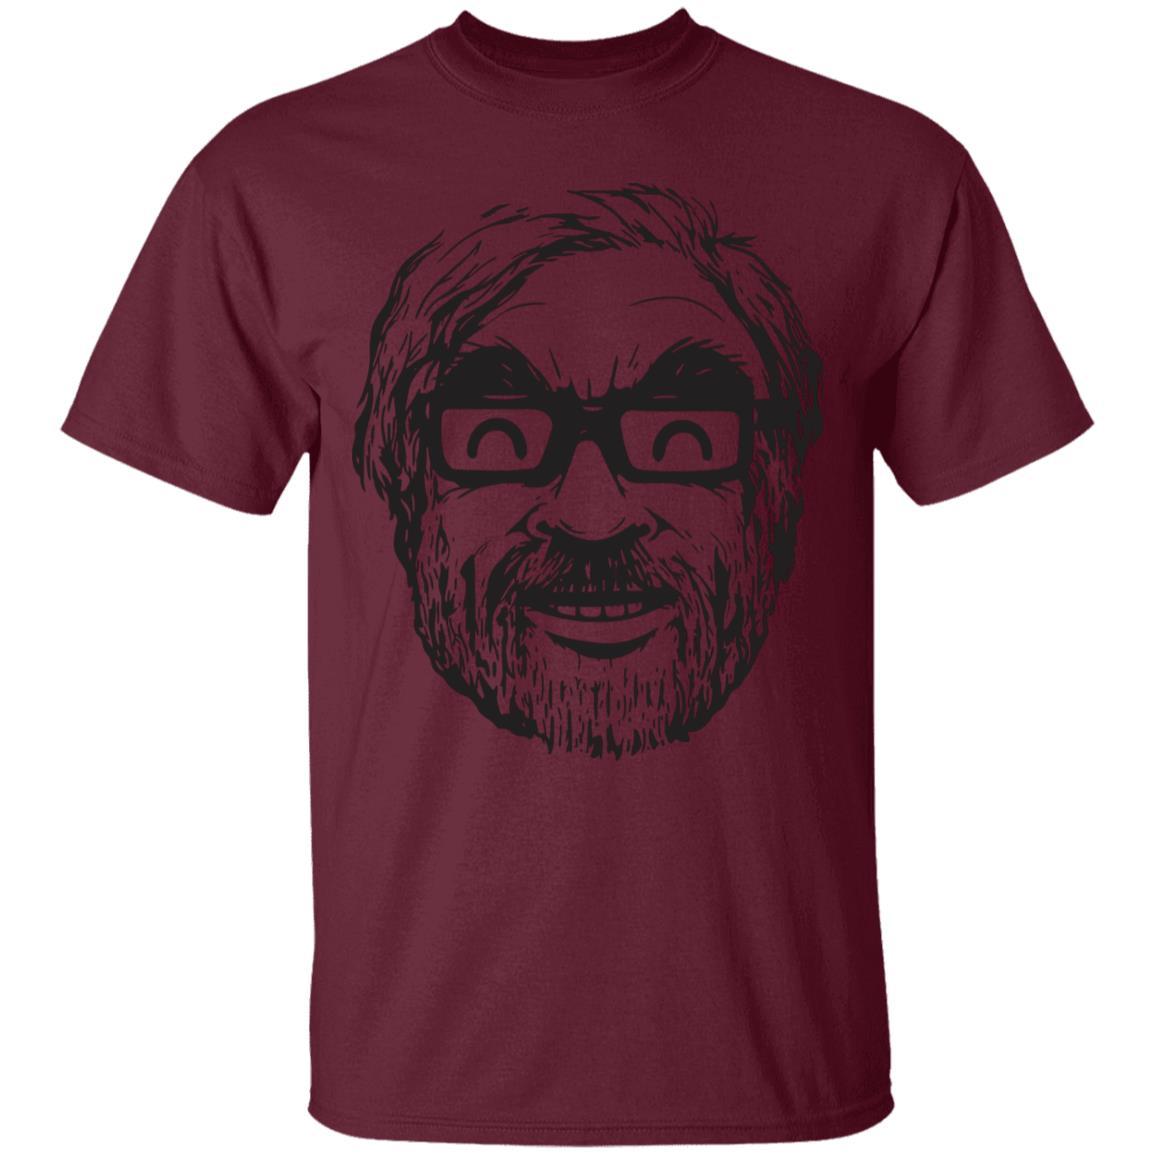 Ghibli Studio – Hayao Miyazaki Portrait T Shirt